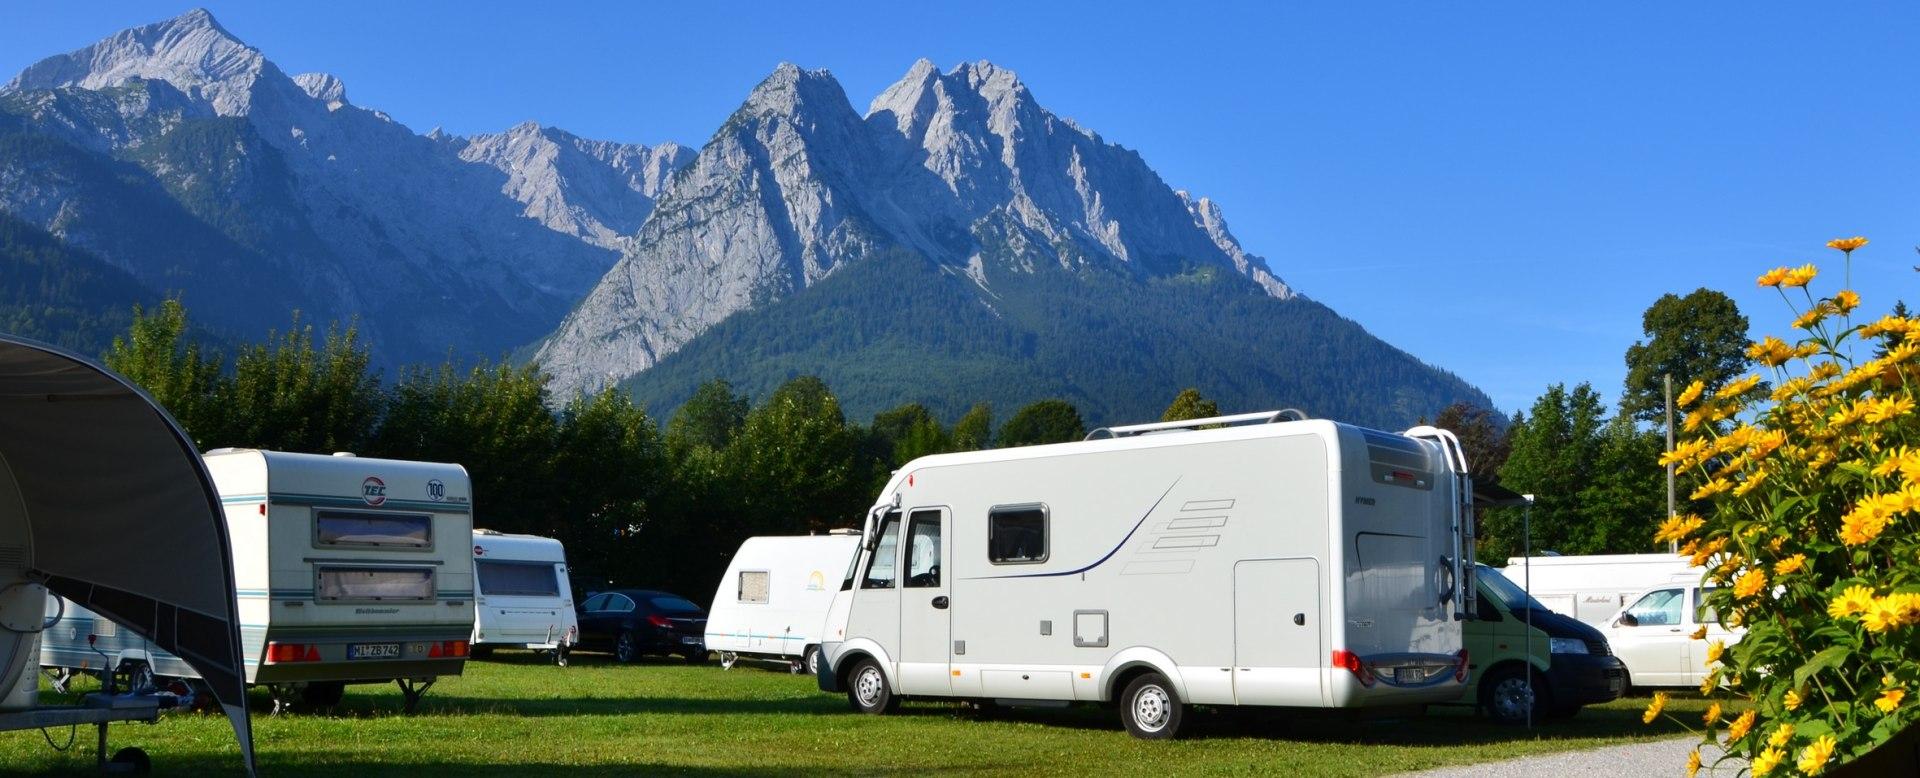 Campsites Grainau, © Campingplatz Grainau